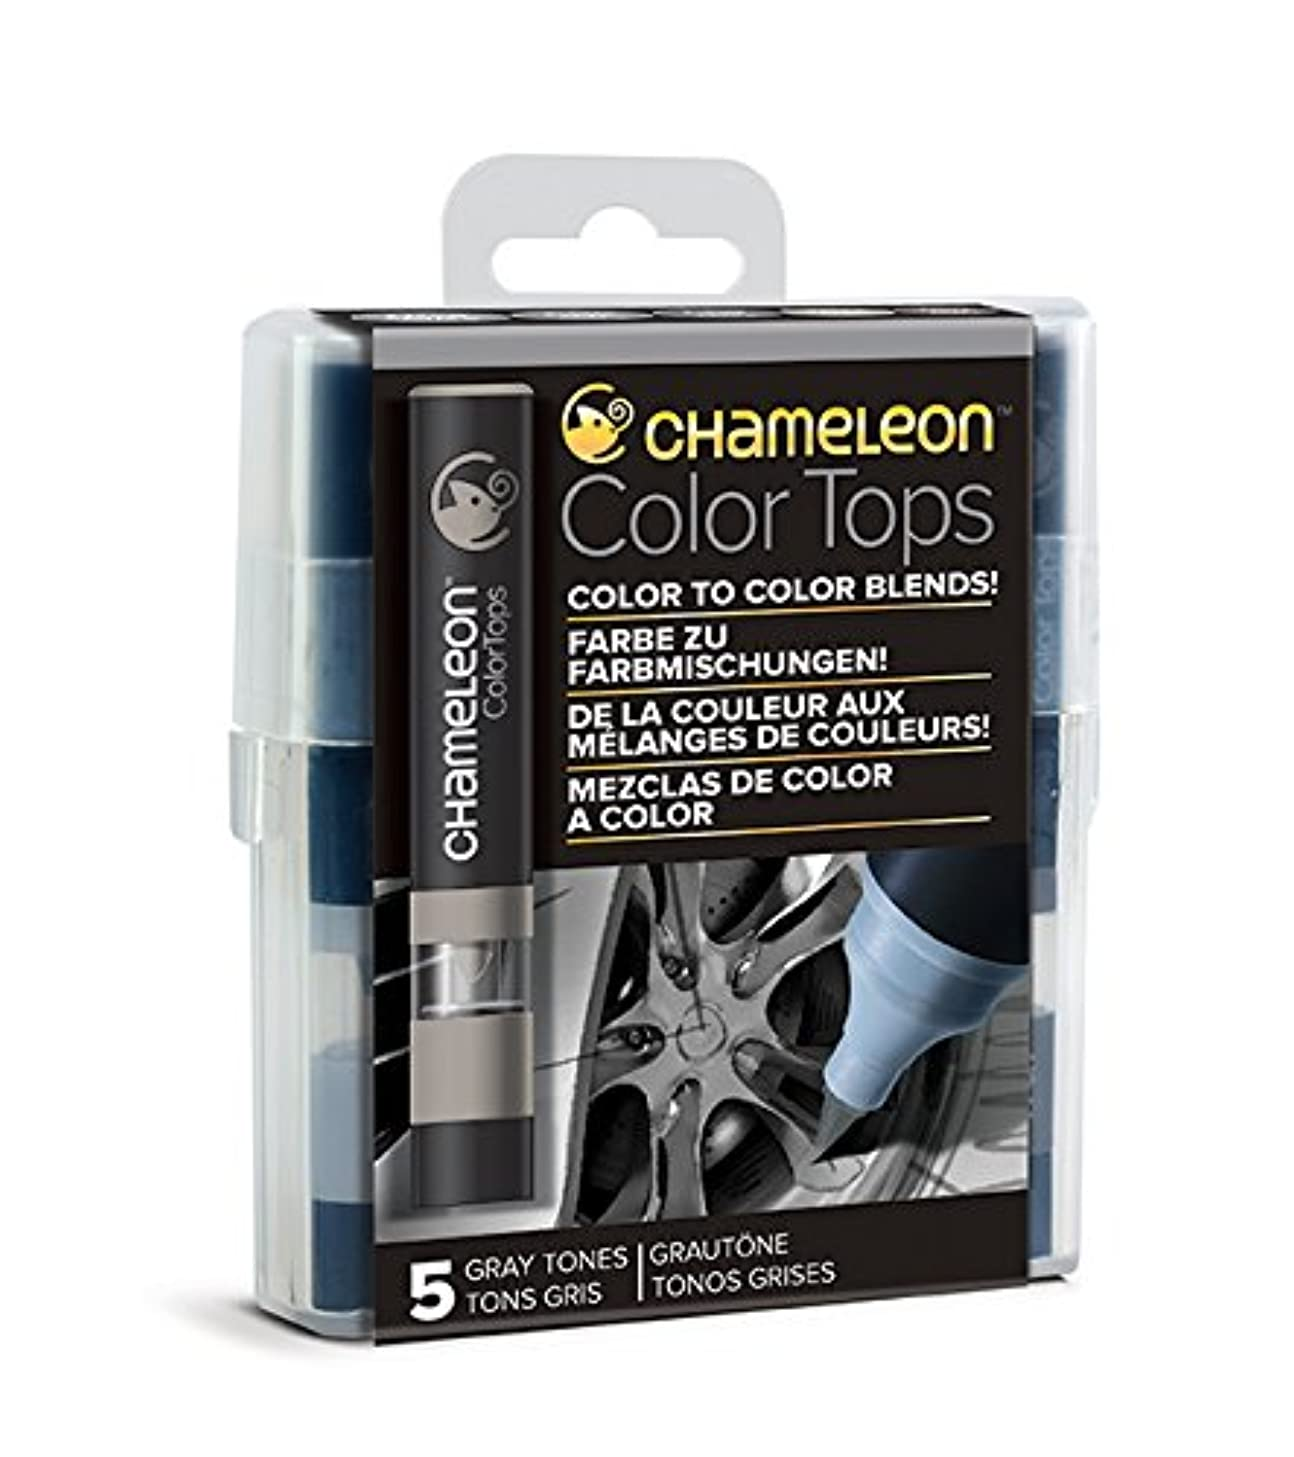 Chameleon Art Products Color Tops, Gray Tones 5-Pen Set